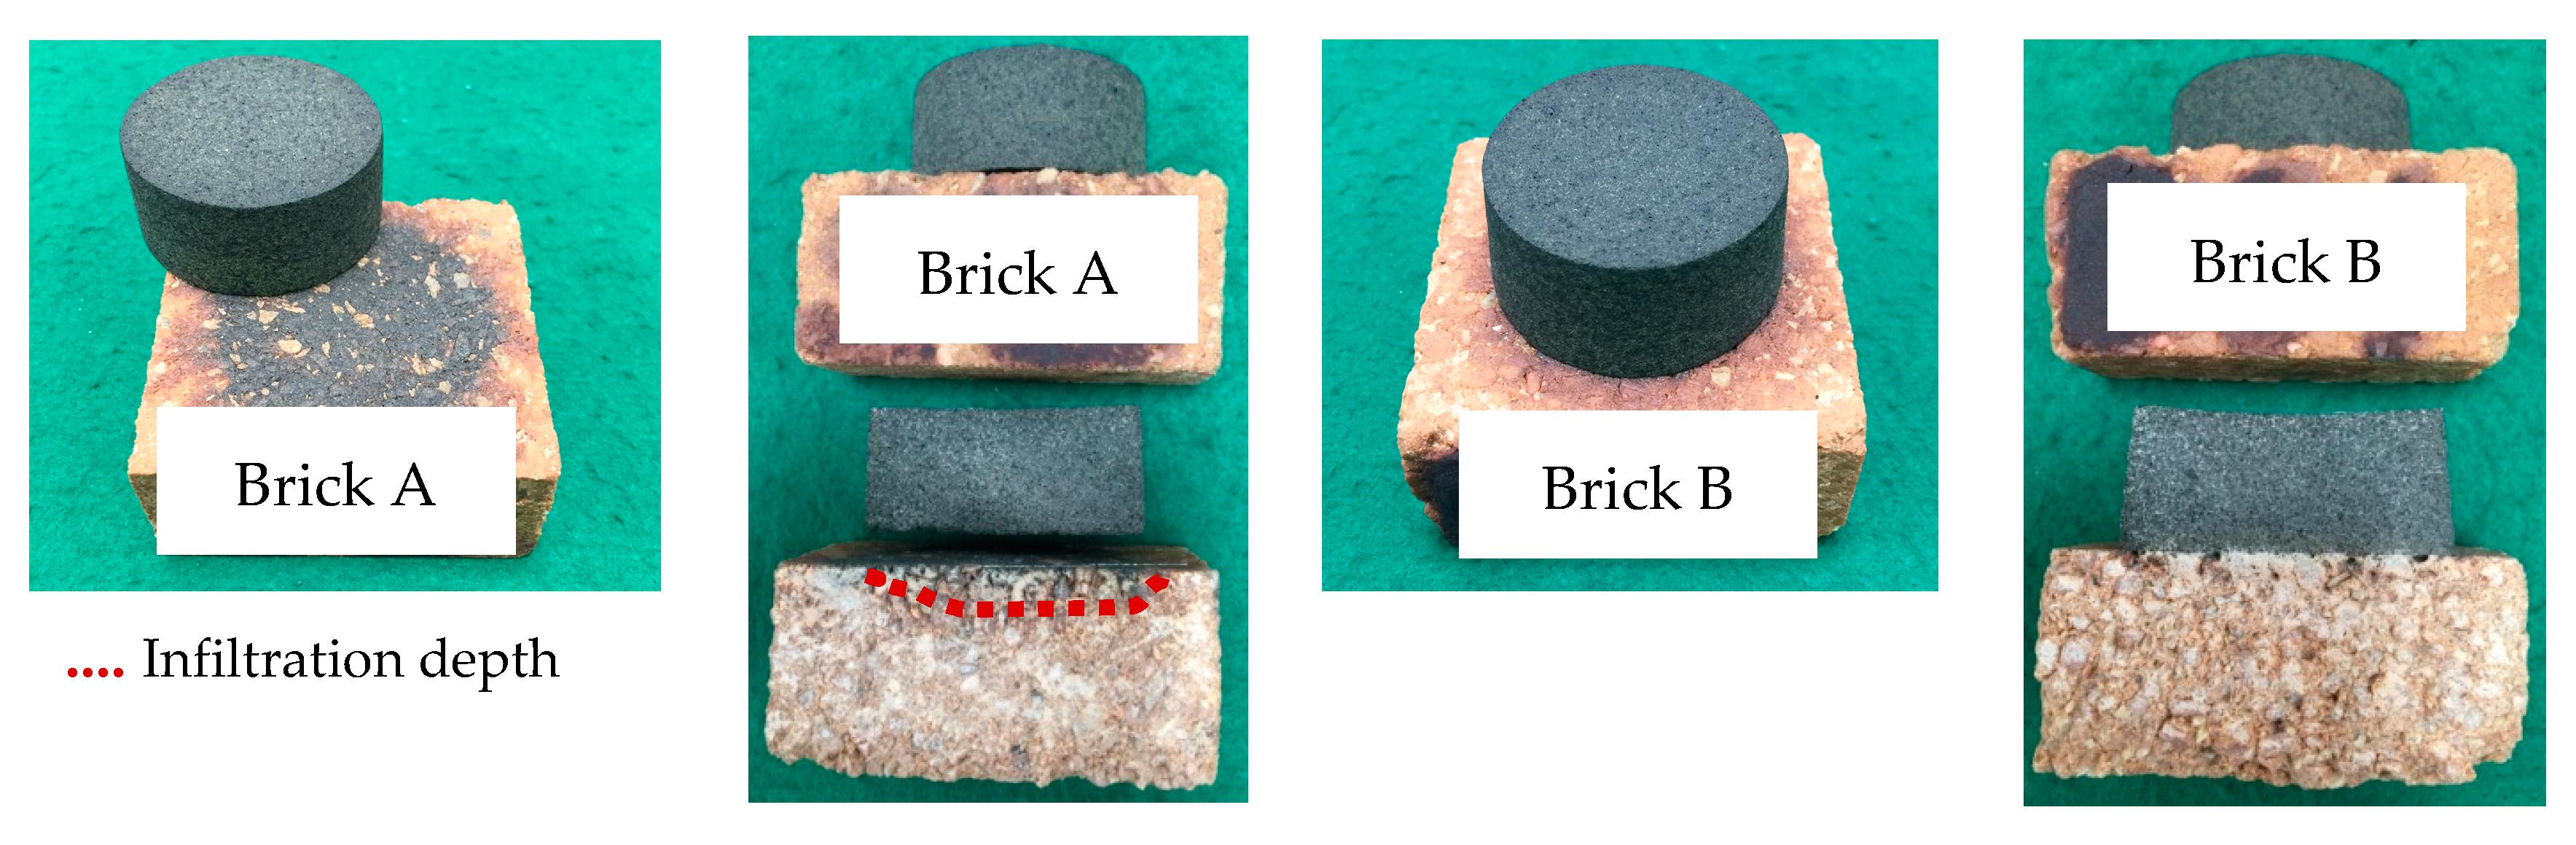 Ceramics Free Full Text Qualitative And Quantitative Coating Tests A Comparison In Magnesia Spinel Refractory Bricks Html